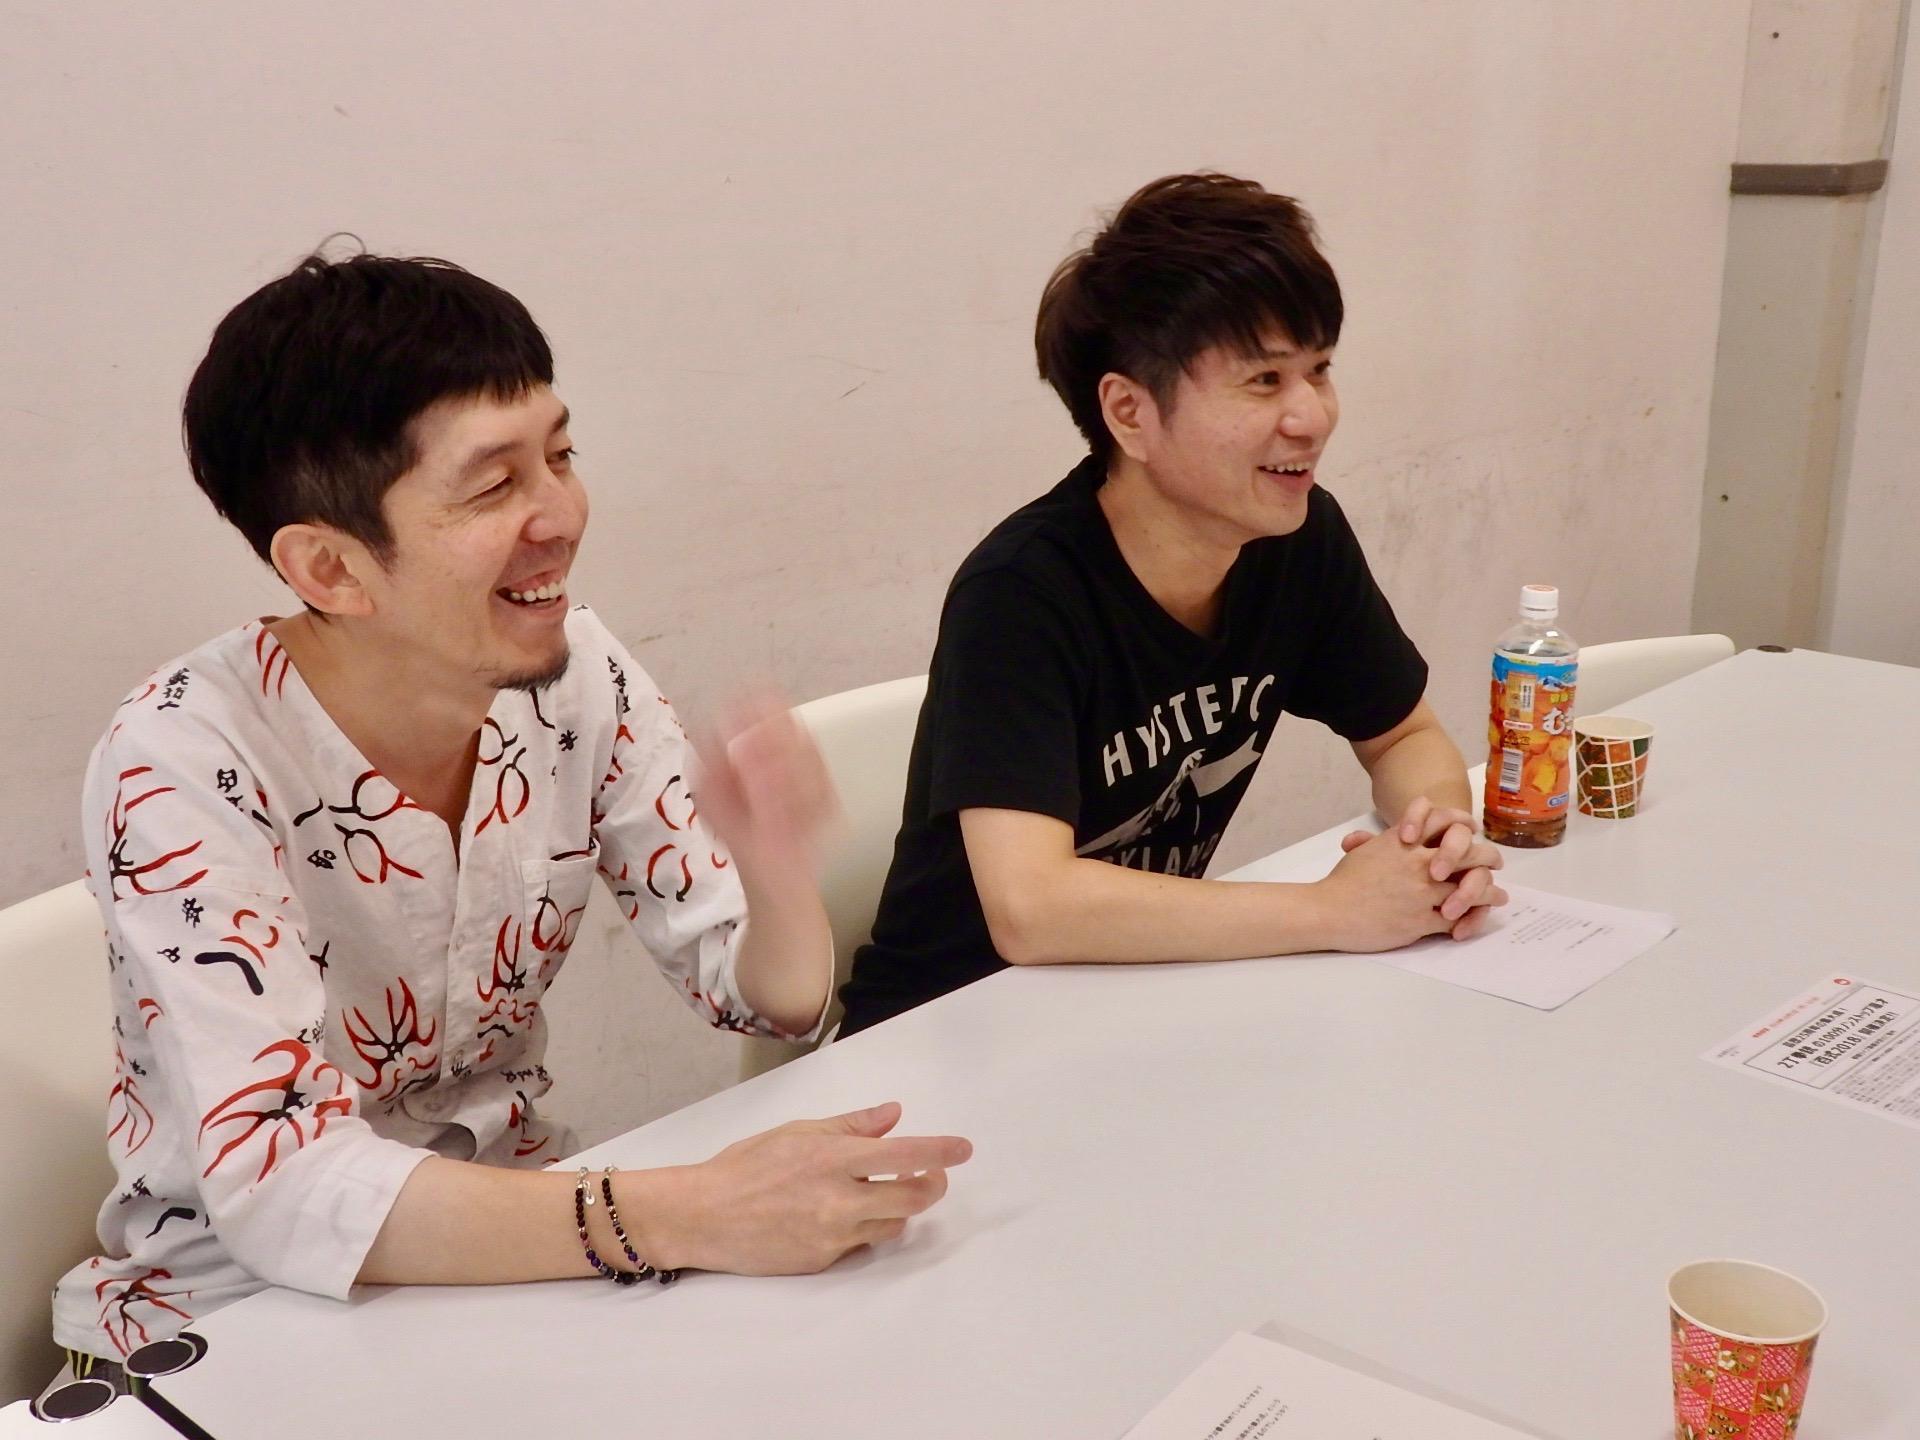 http://news.yoshimoto.co.jp/20181219055734-8654f9b68173196471395663dca181133aa63b4c.jpeg